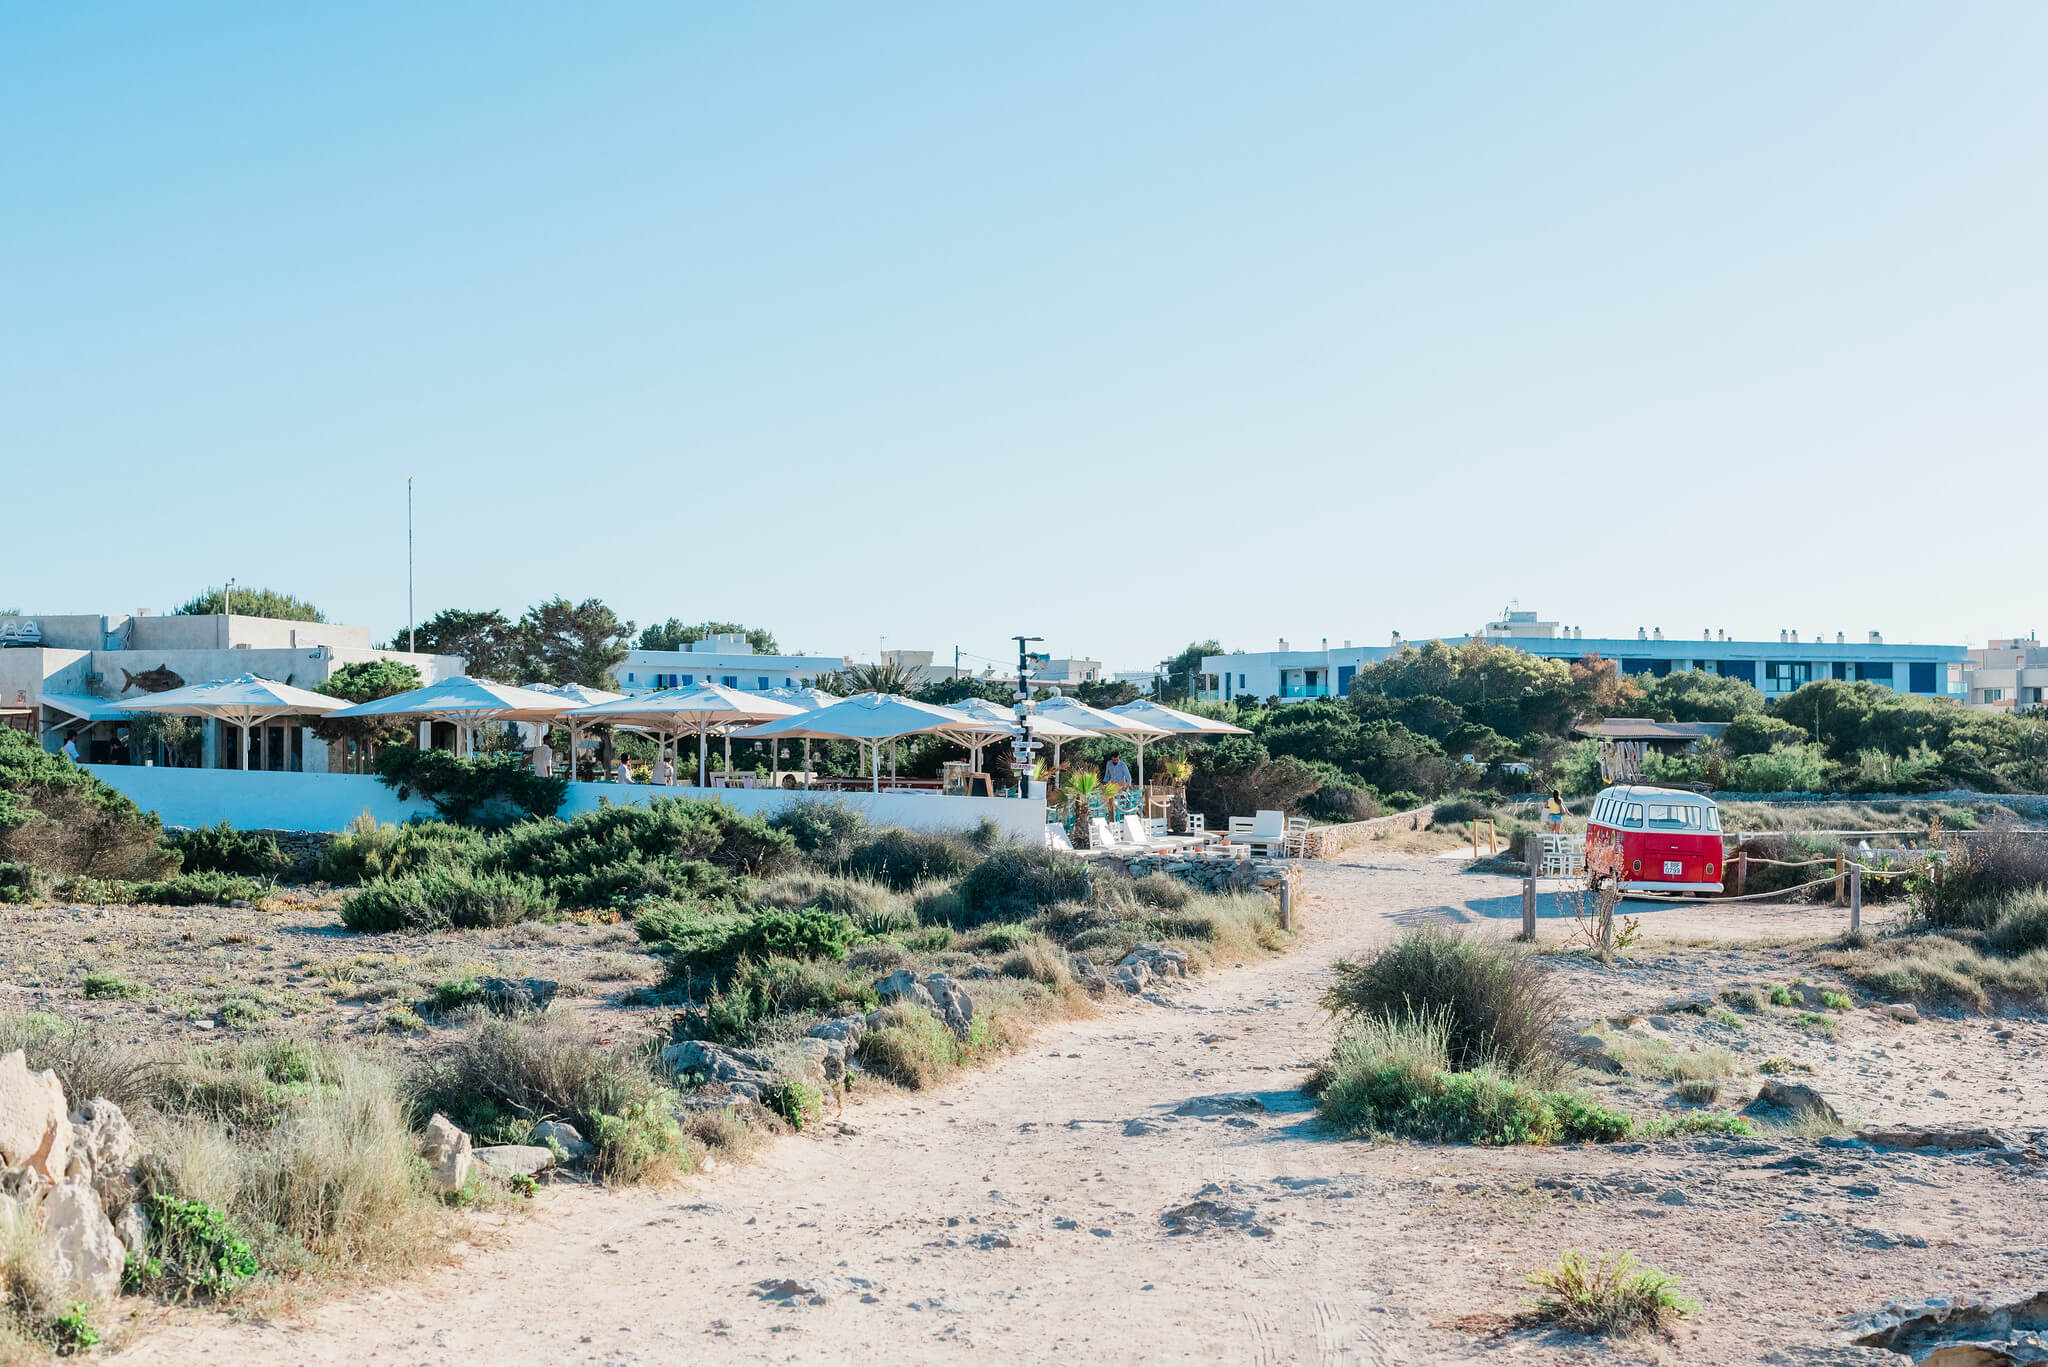 https://www.white-ibiza.com/wp-content/uploads/2020/03/formentera-beach-restaurants-chezz-gerdi-2020-11.jpg